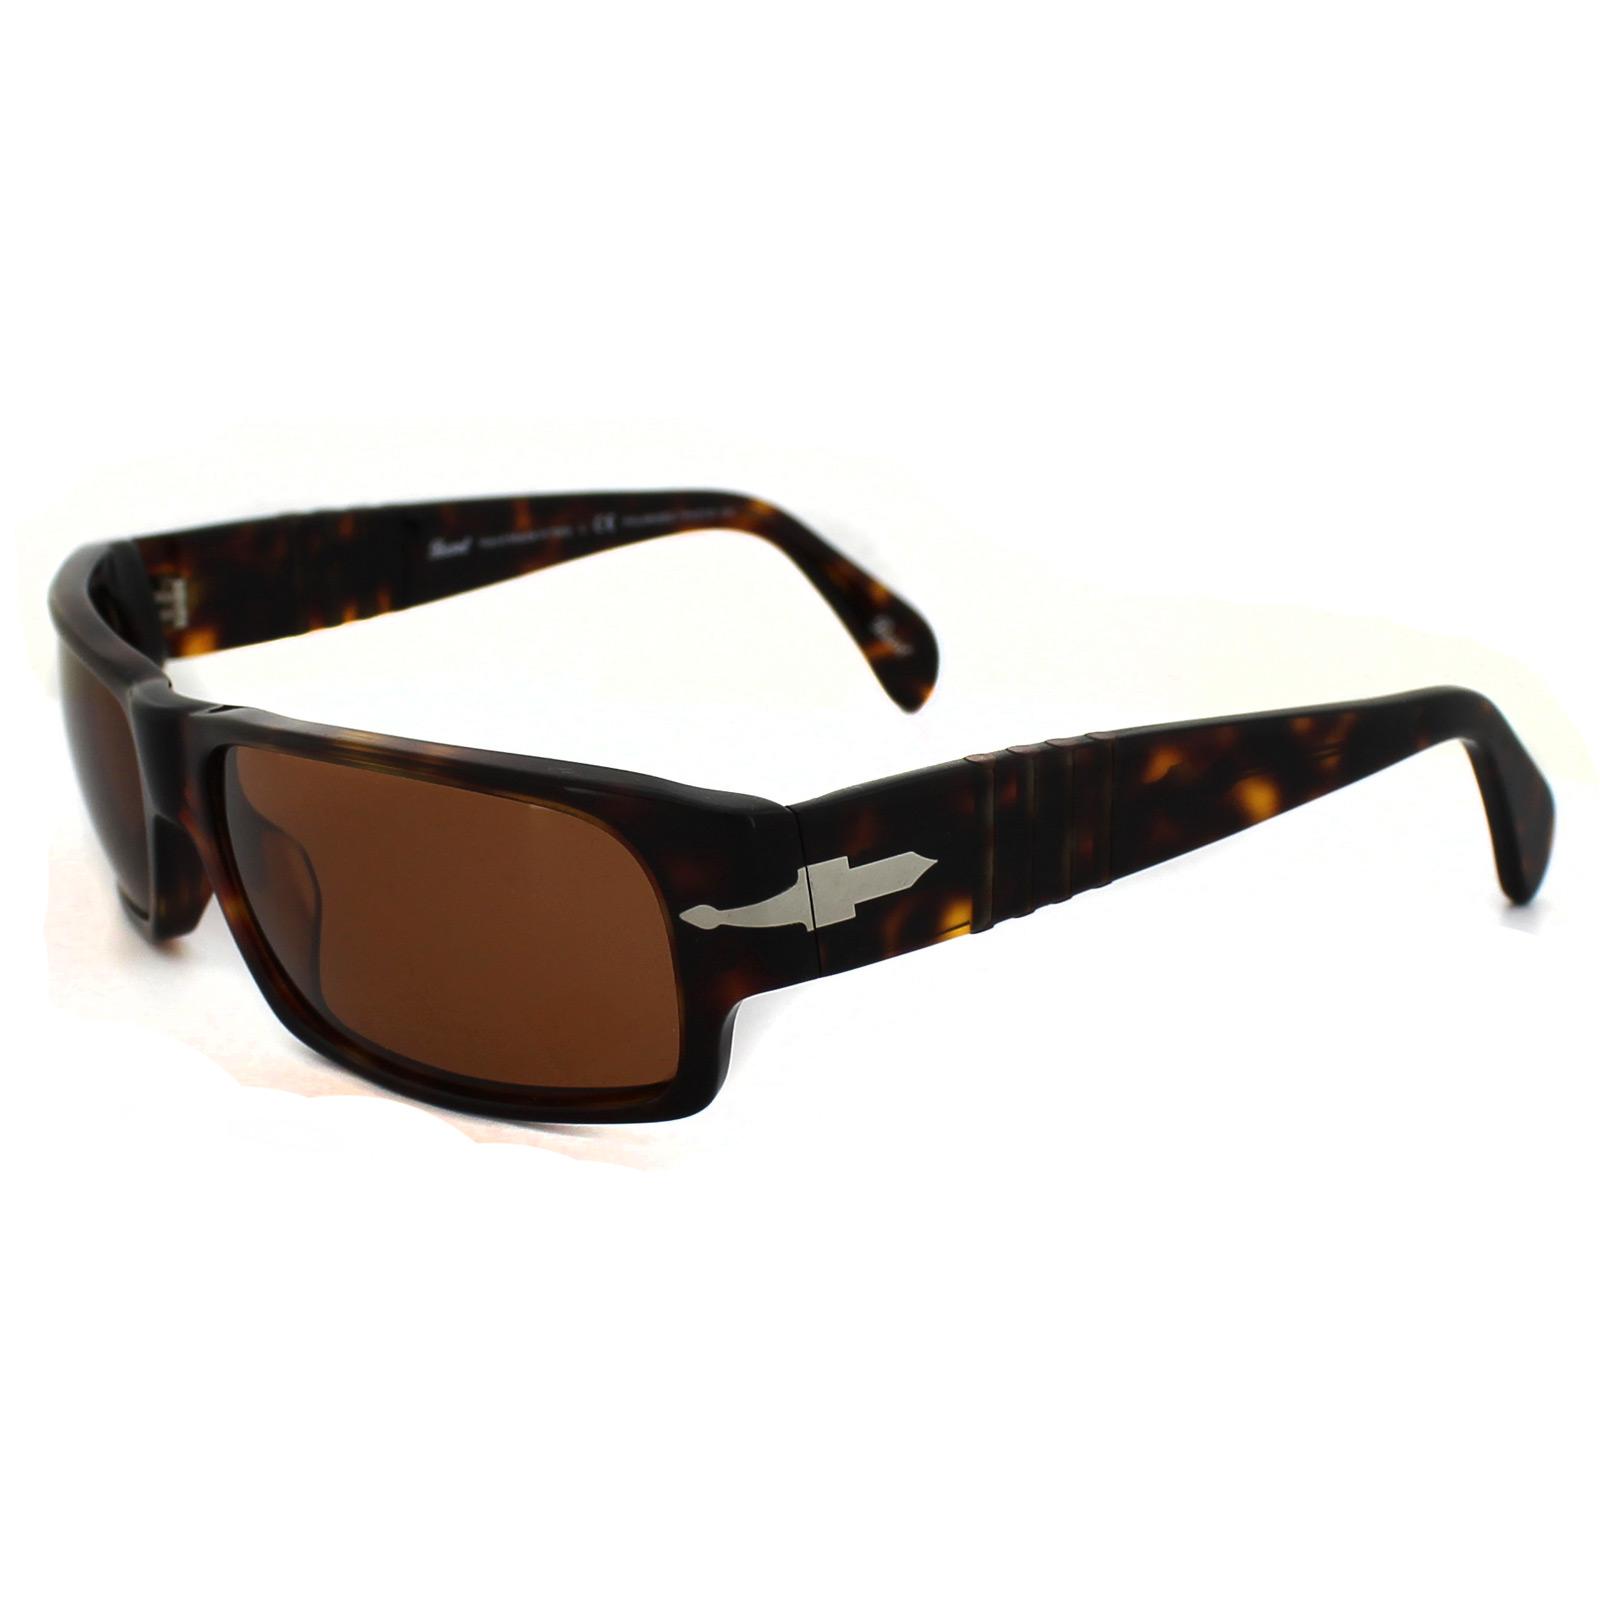 Cheap Persol 2720 Sunglasses Discounted Sunglasses